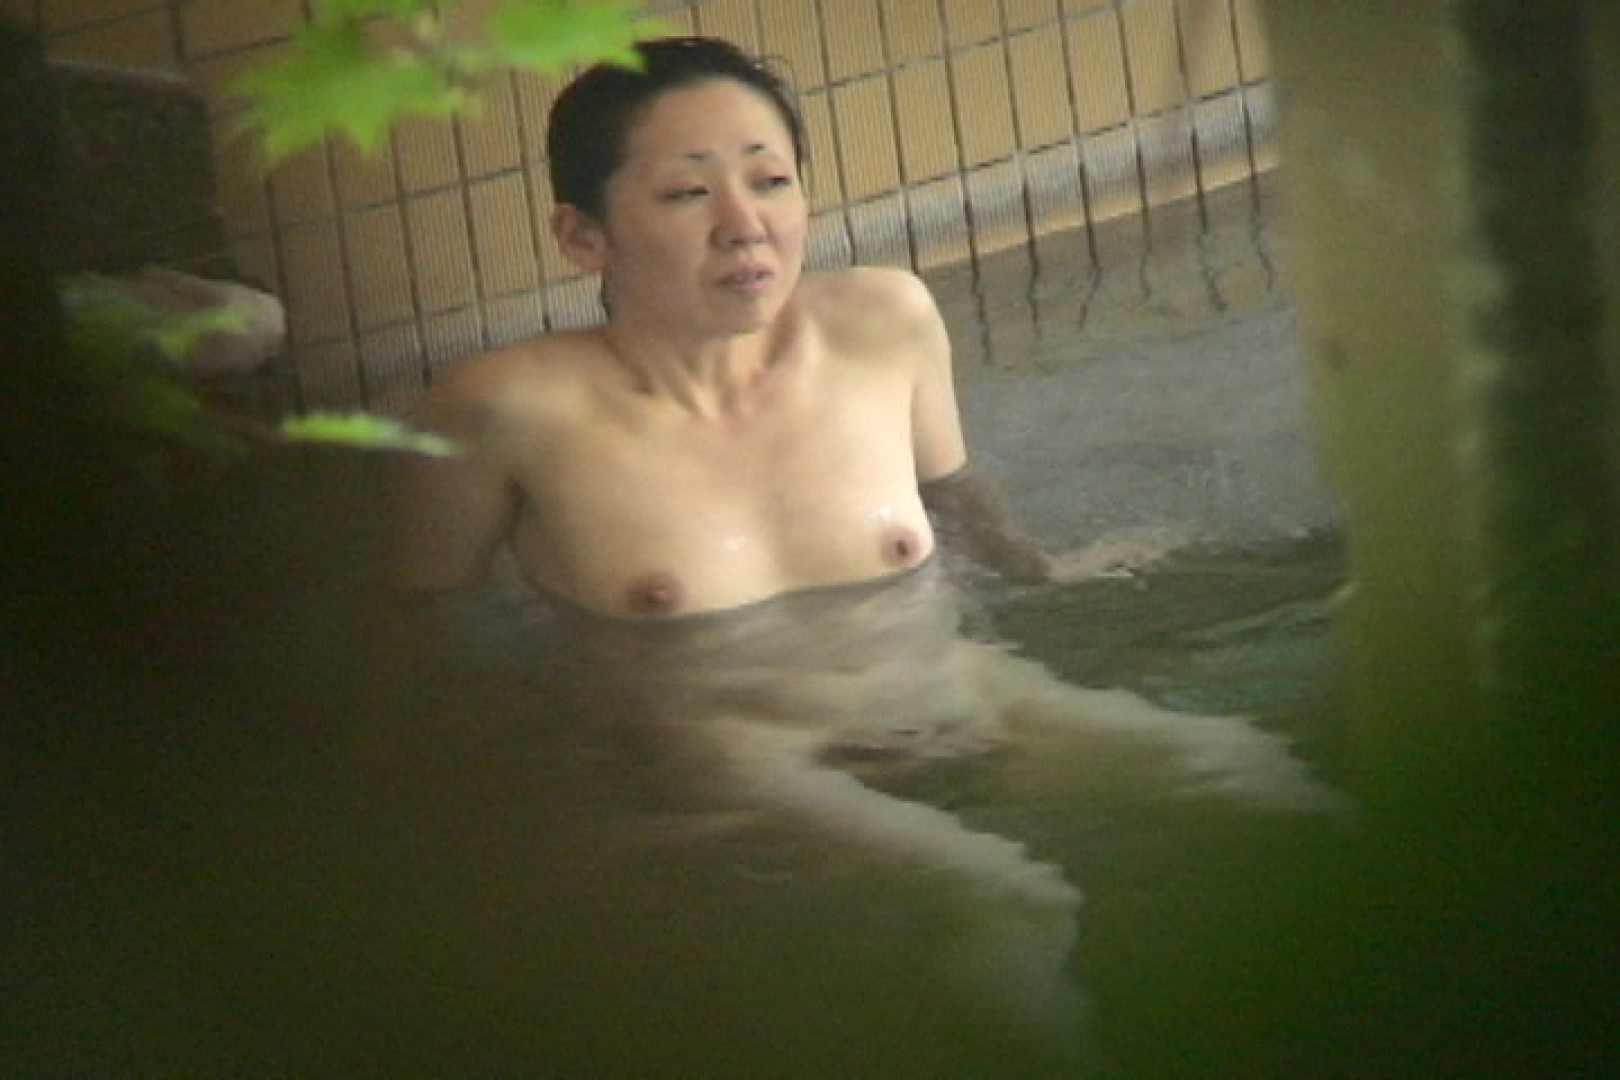 Aquaな露天風呂Vol.449 盗撮 | HなOL  101pic 14